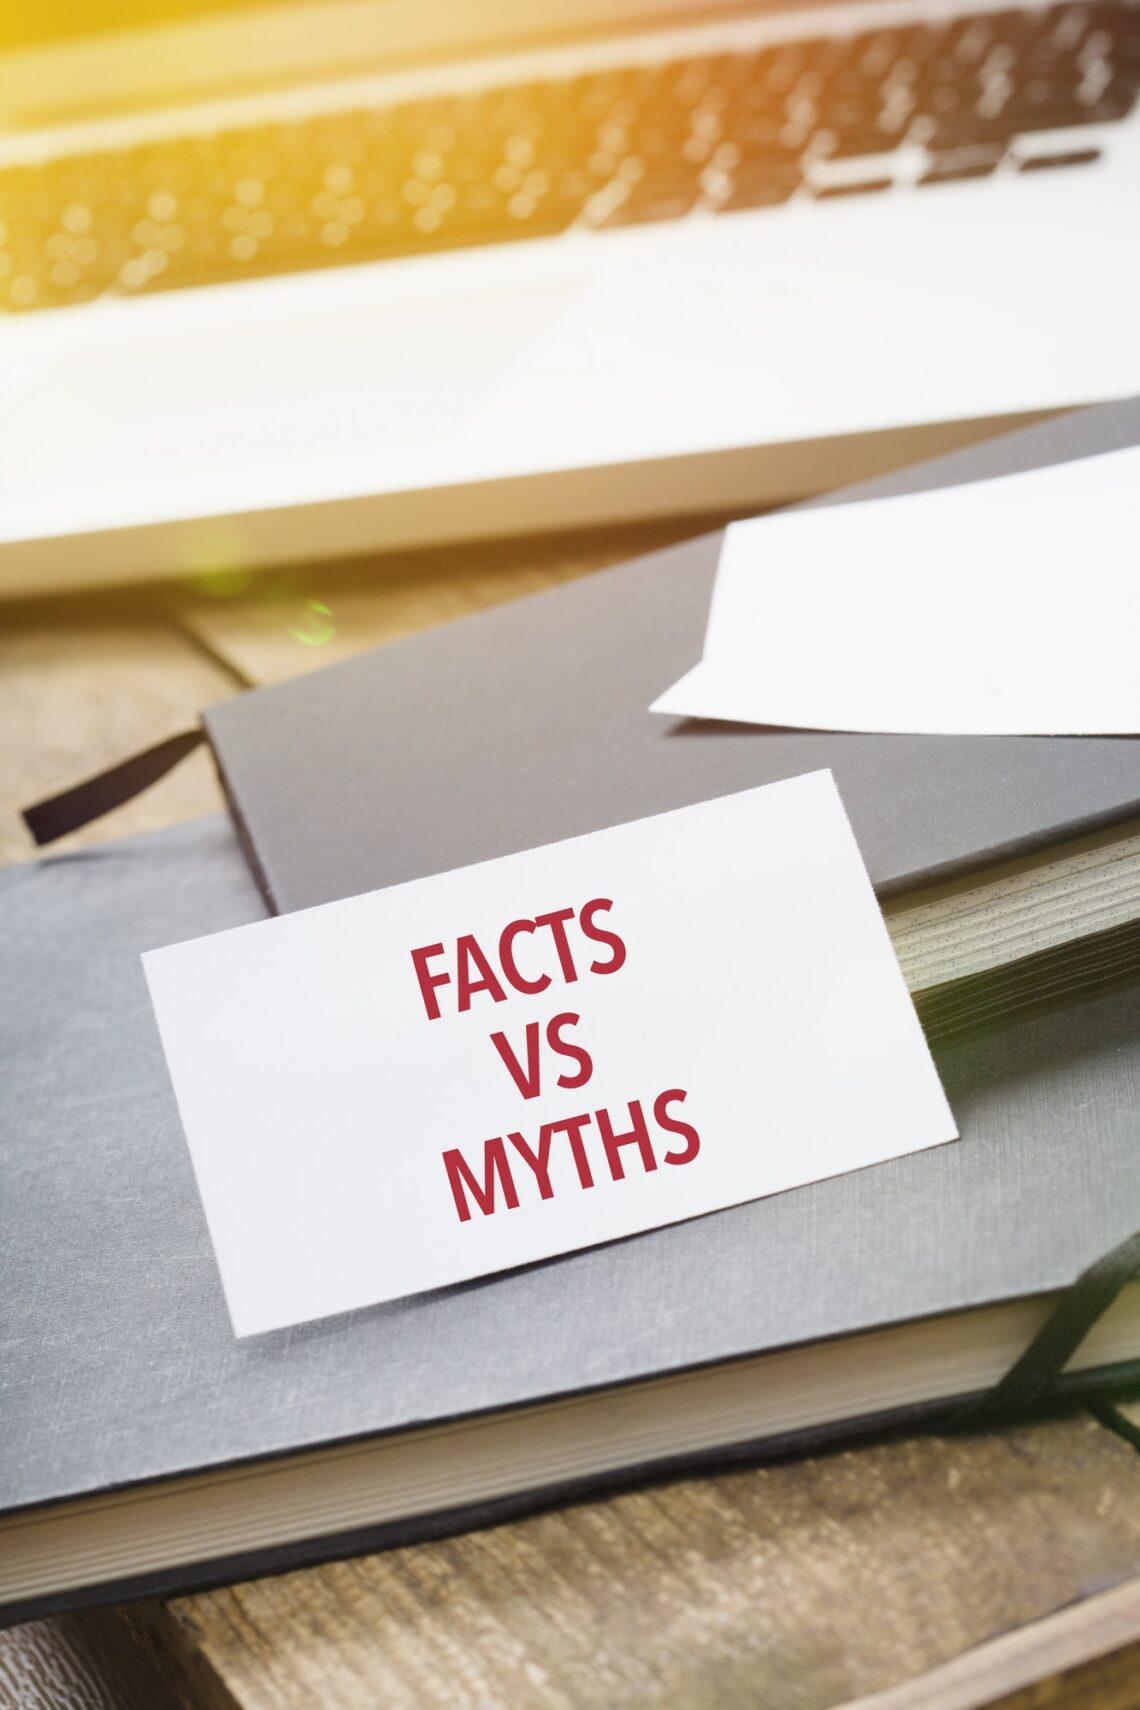 Facts vs Myths on card at office desktop